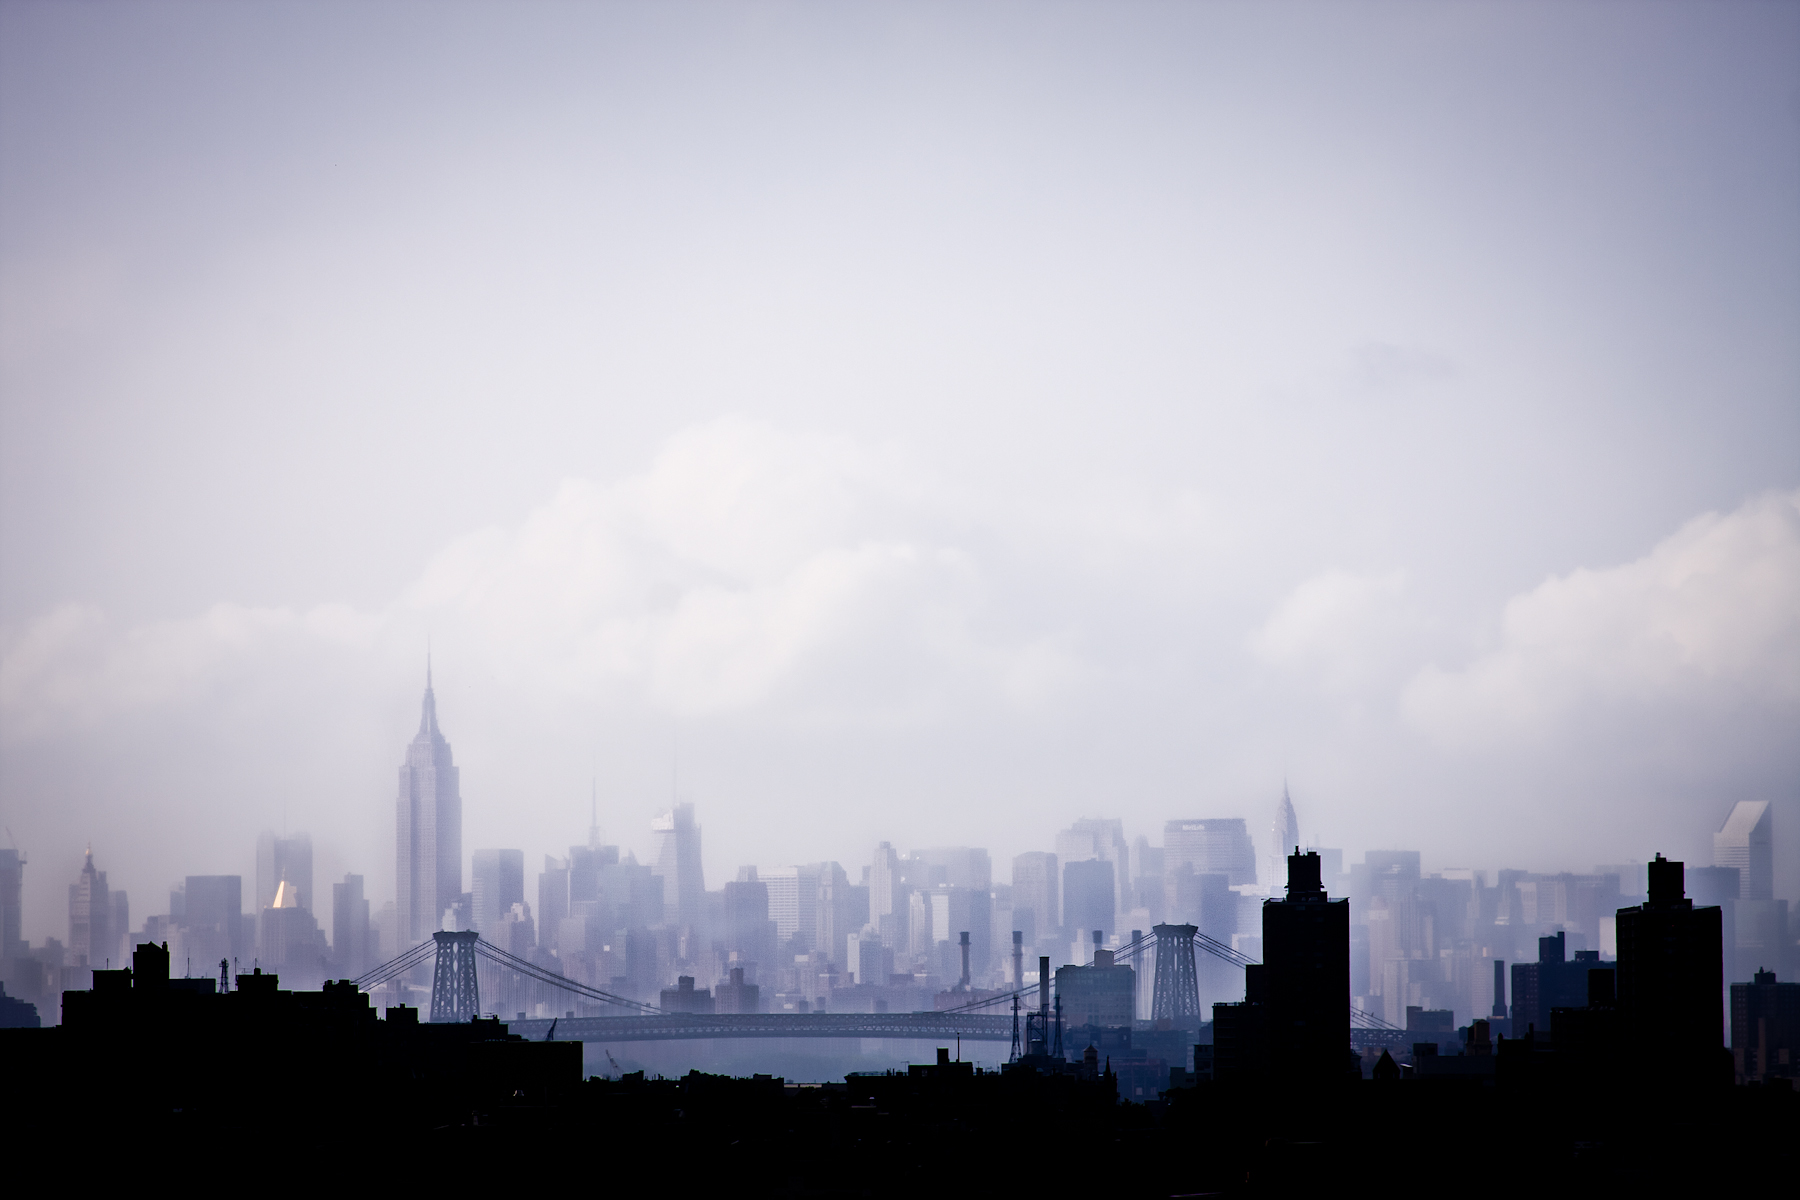 city view_9261.jpg